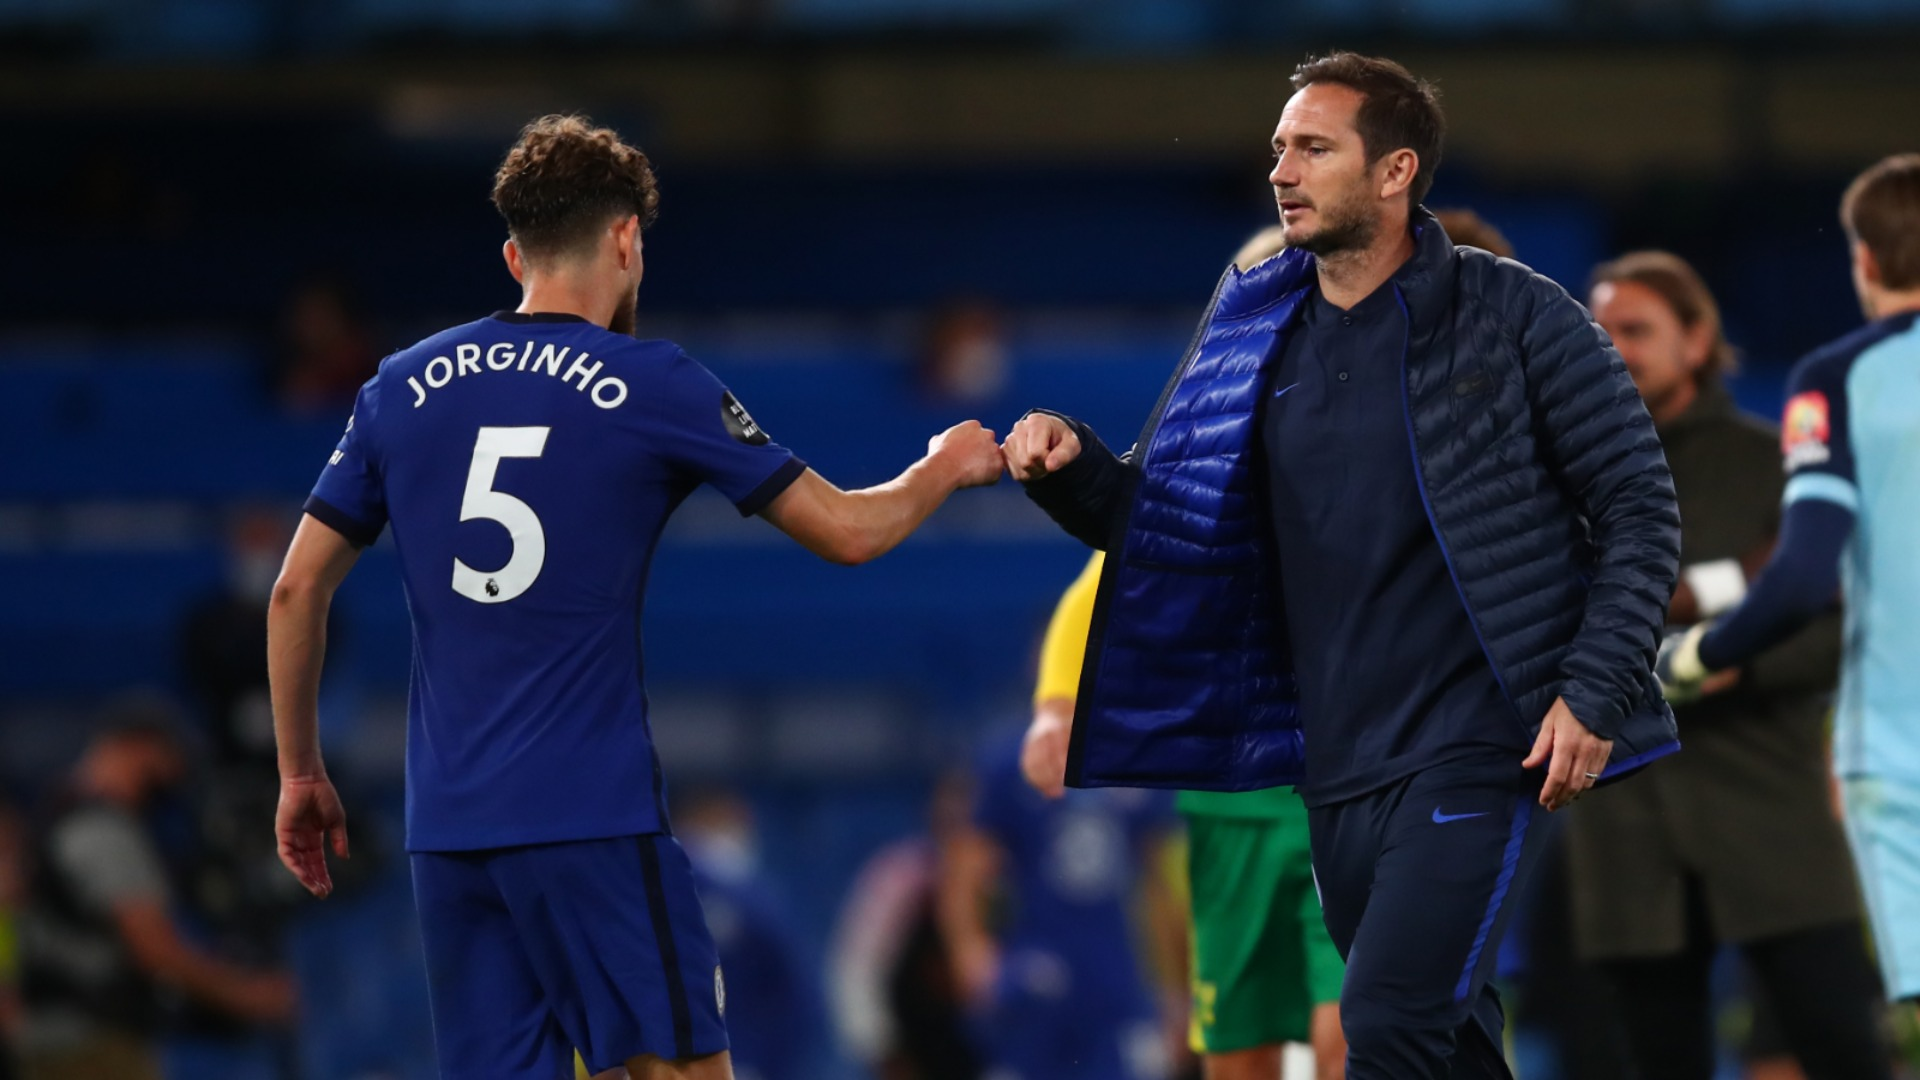 Lampard wasn't ready for Chelsea job - Jorginho